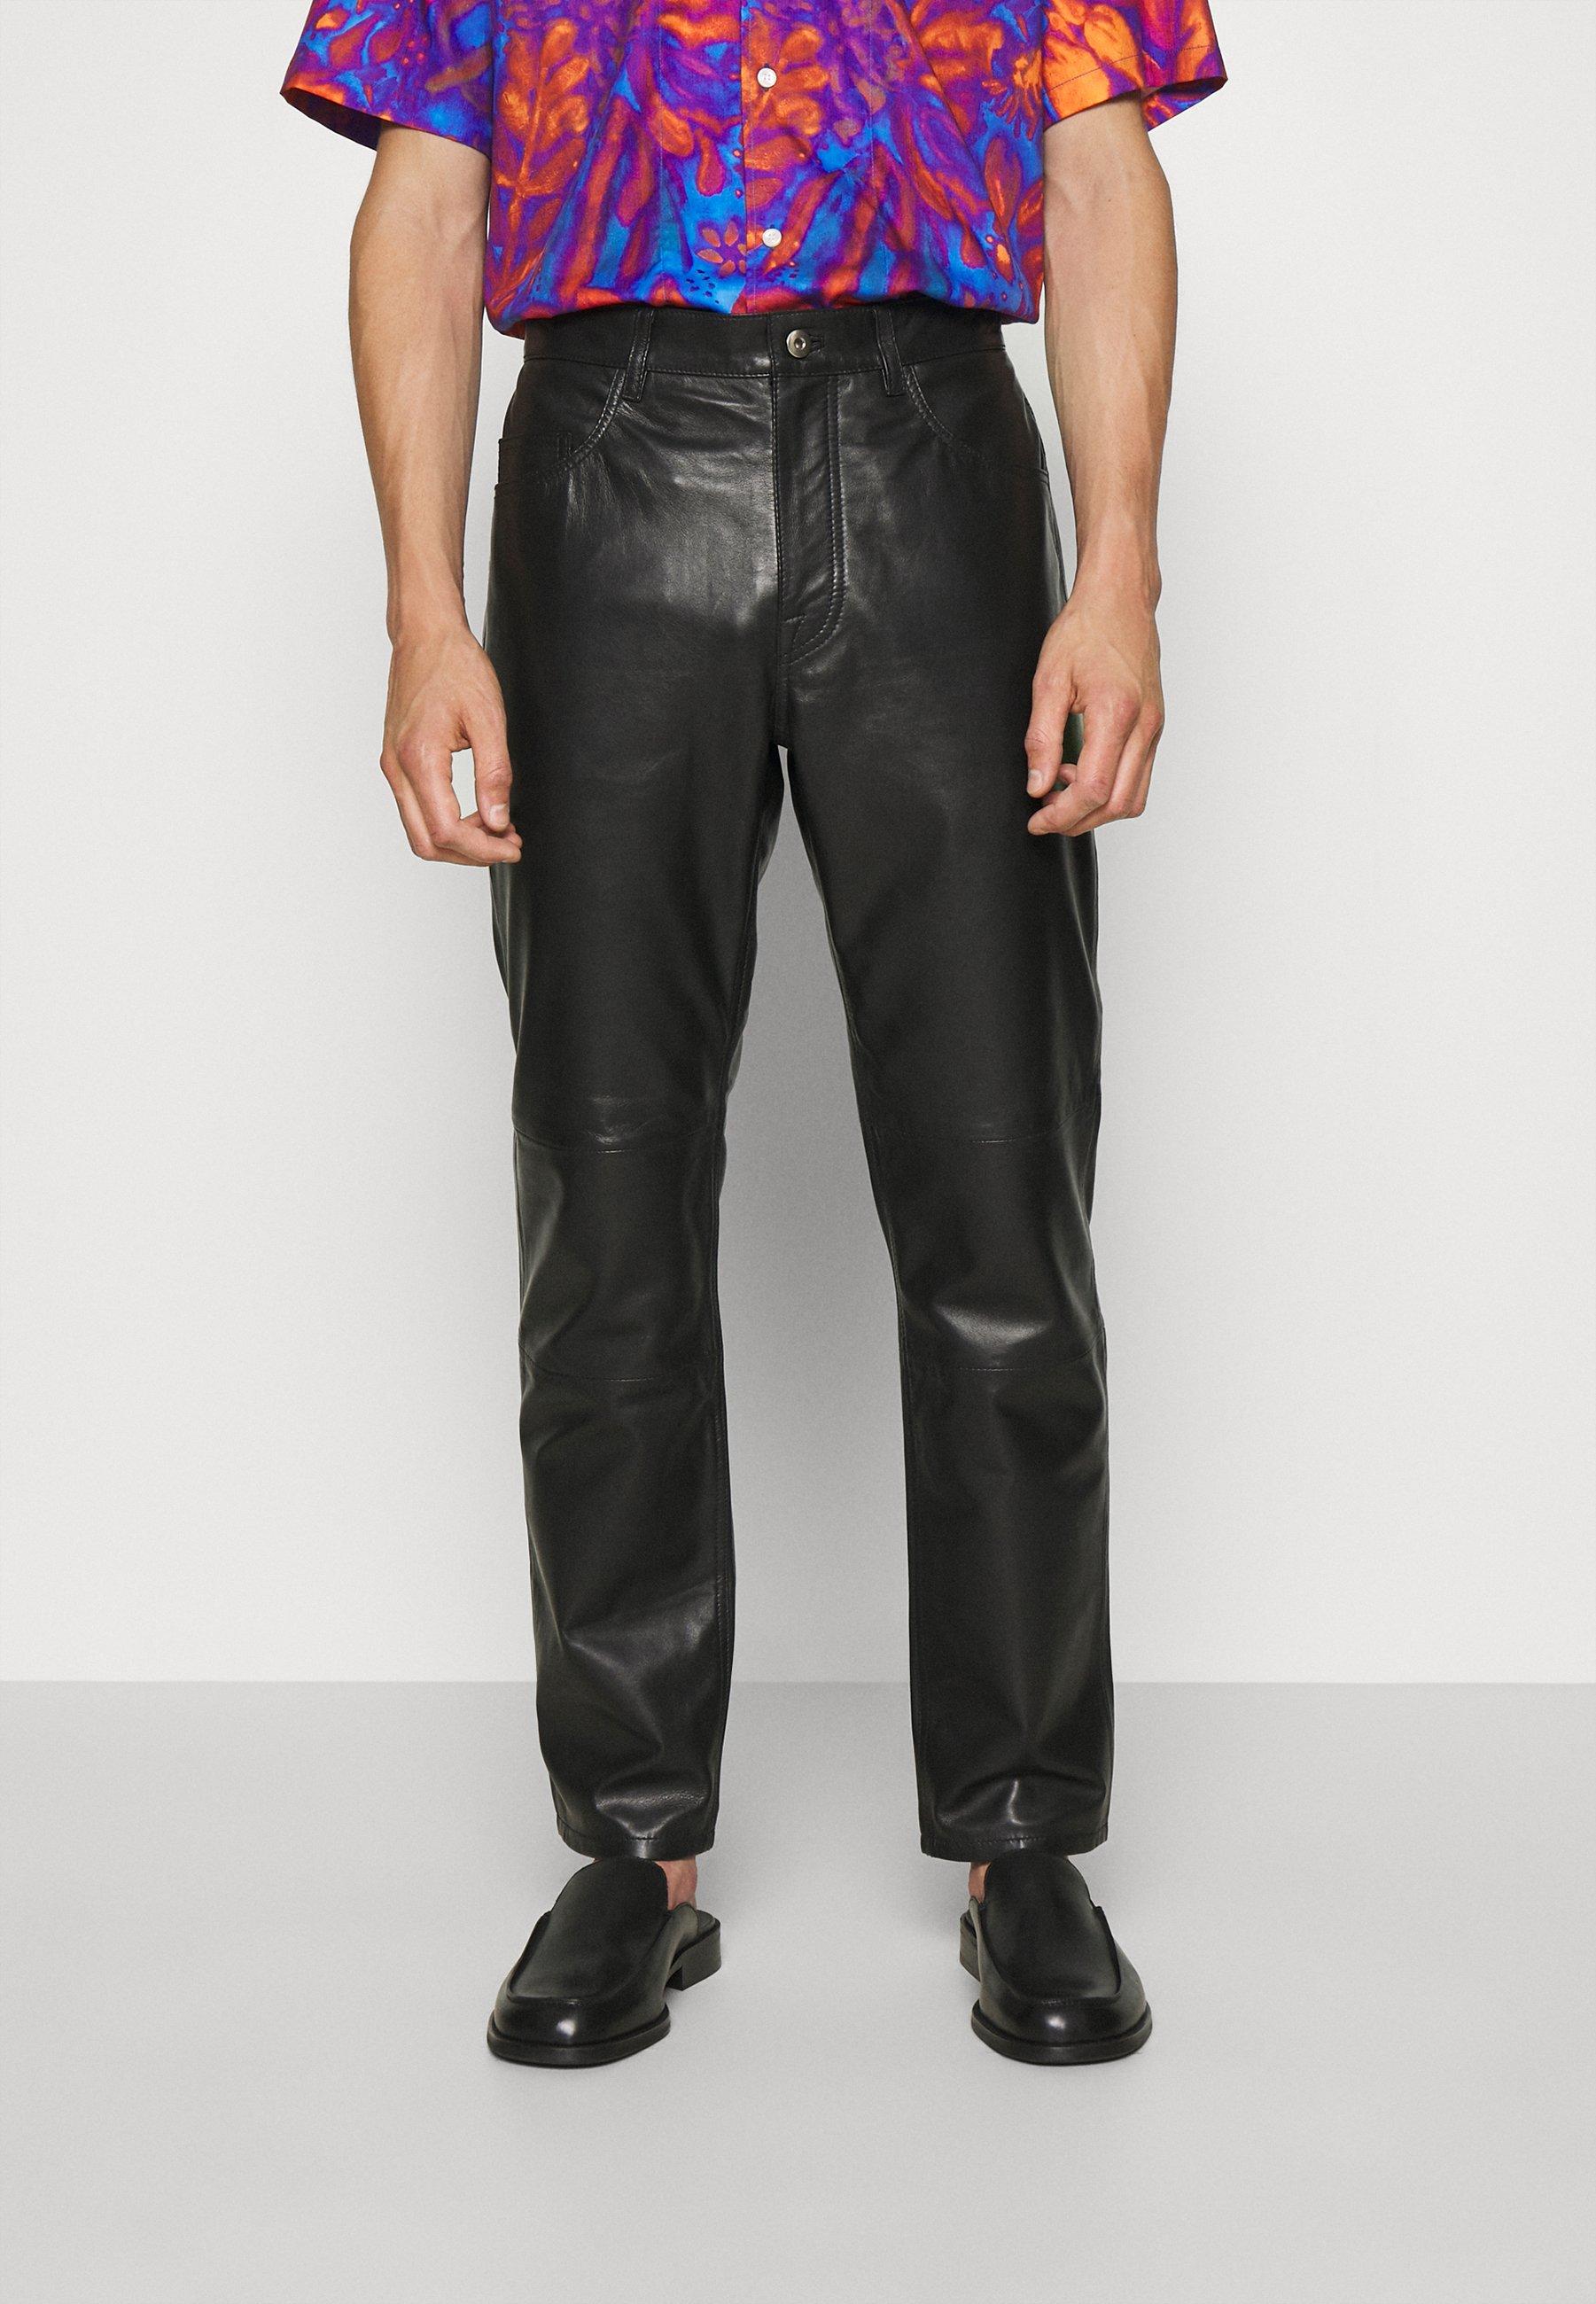 Uomo ABNERE  - Pantaloni di pelle